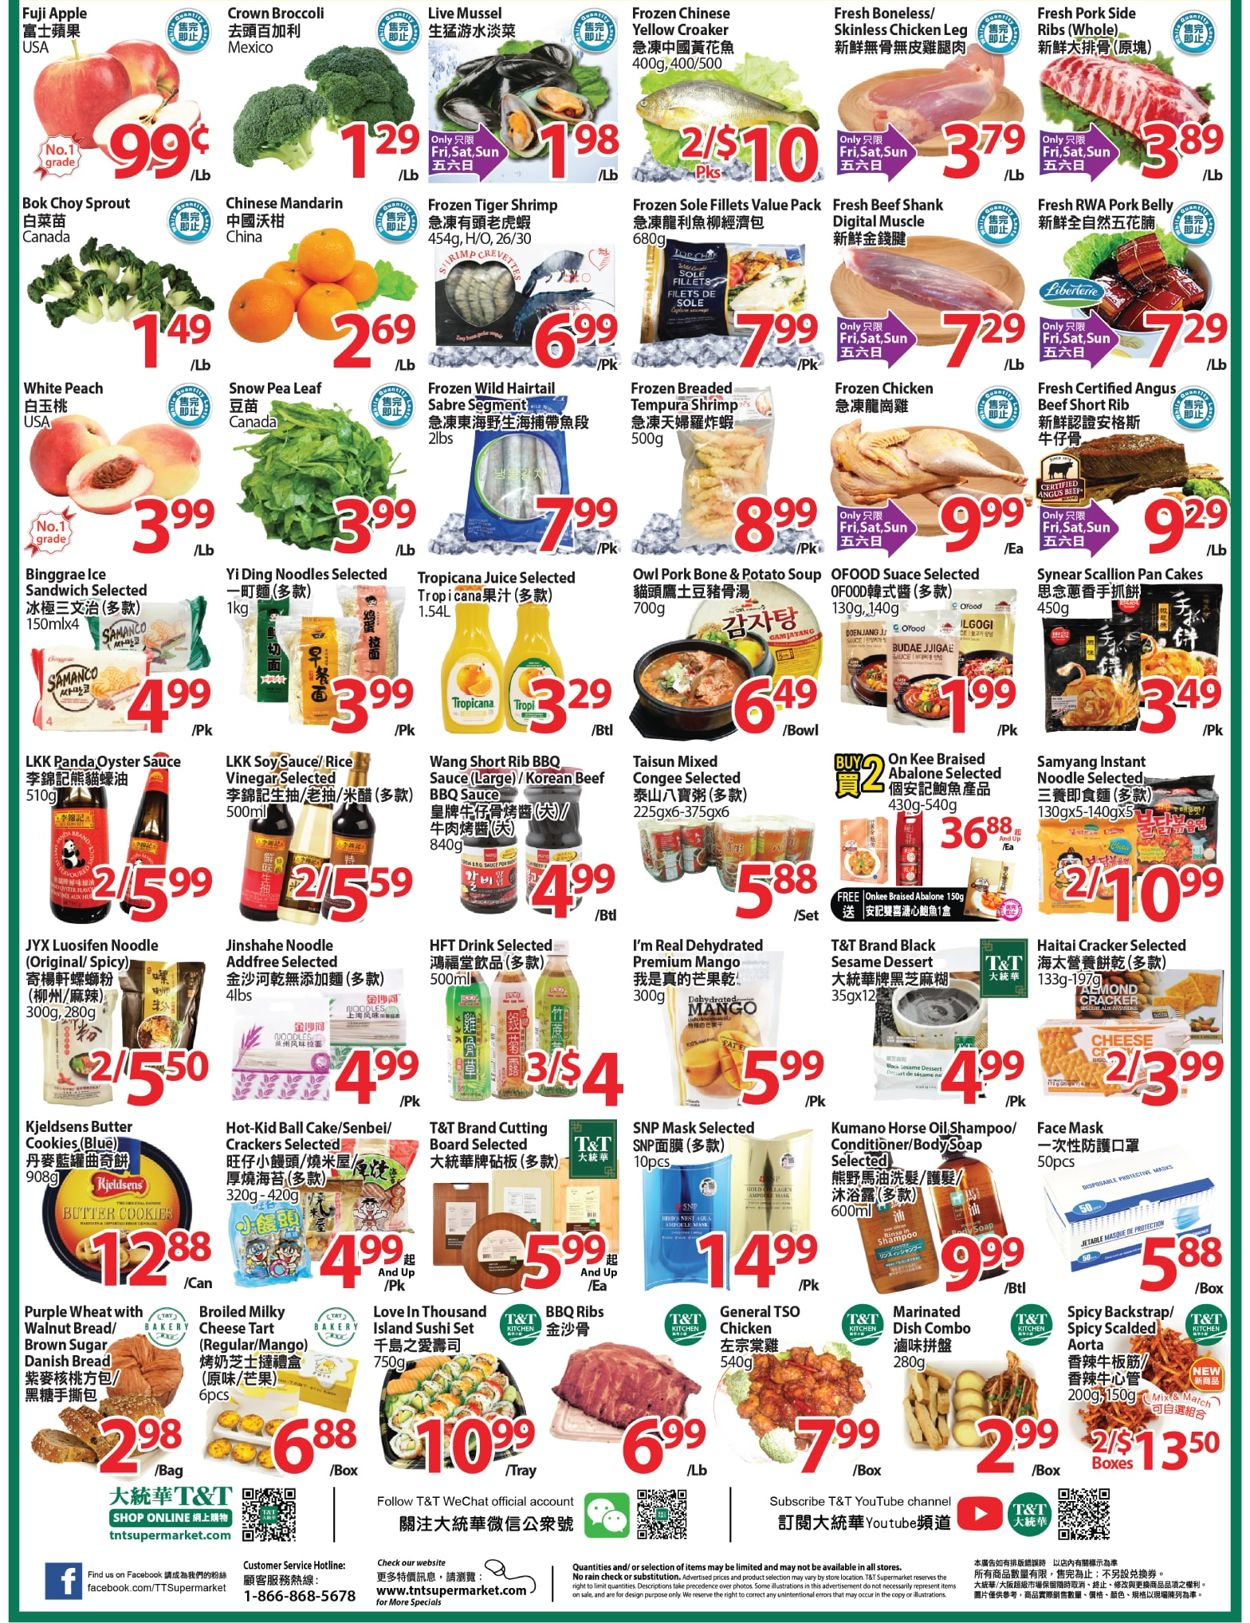 T&T Supermarket - Waterloo Flyer - 06/04-06/10/2021 (Page 2)